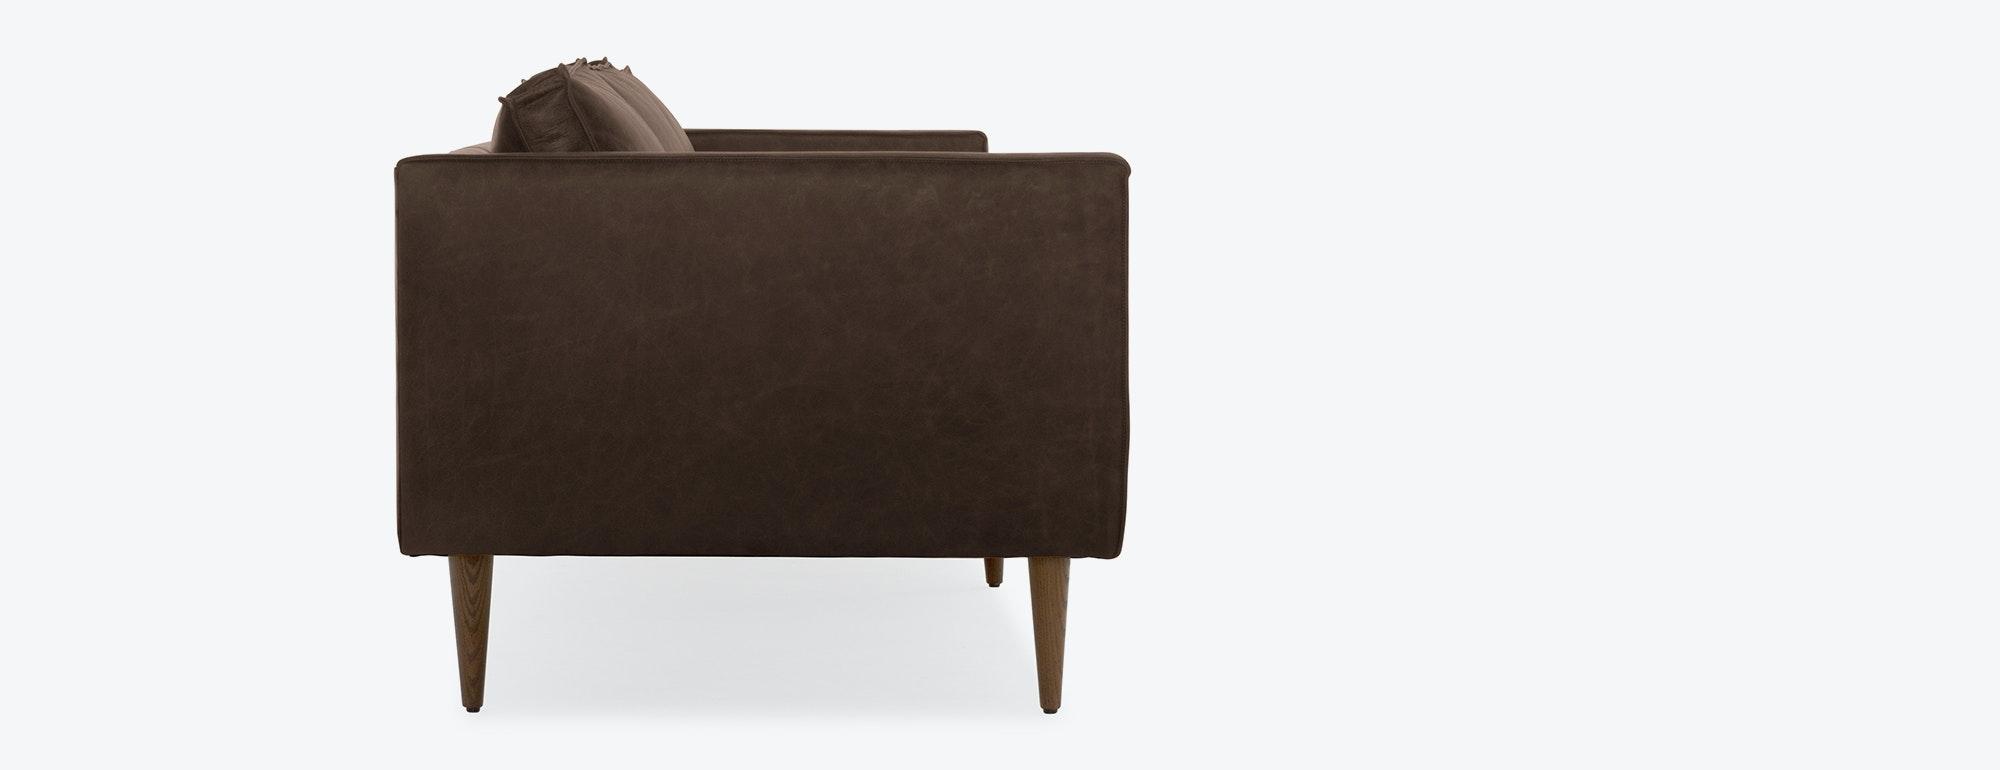 shown in Brompton Mocha Leather